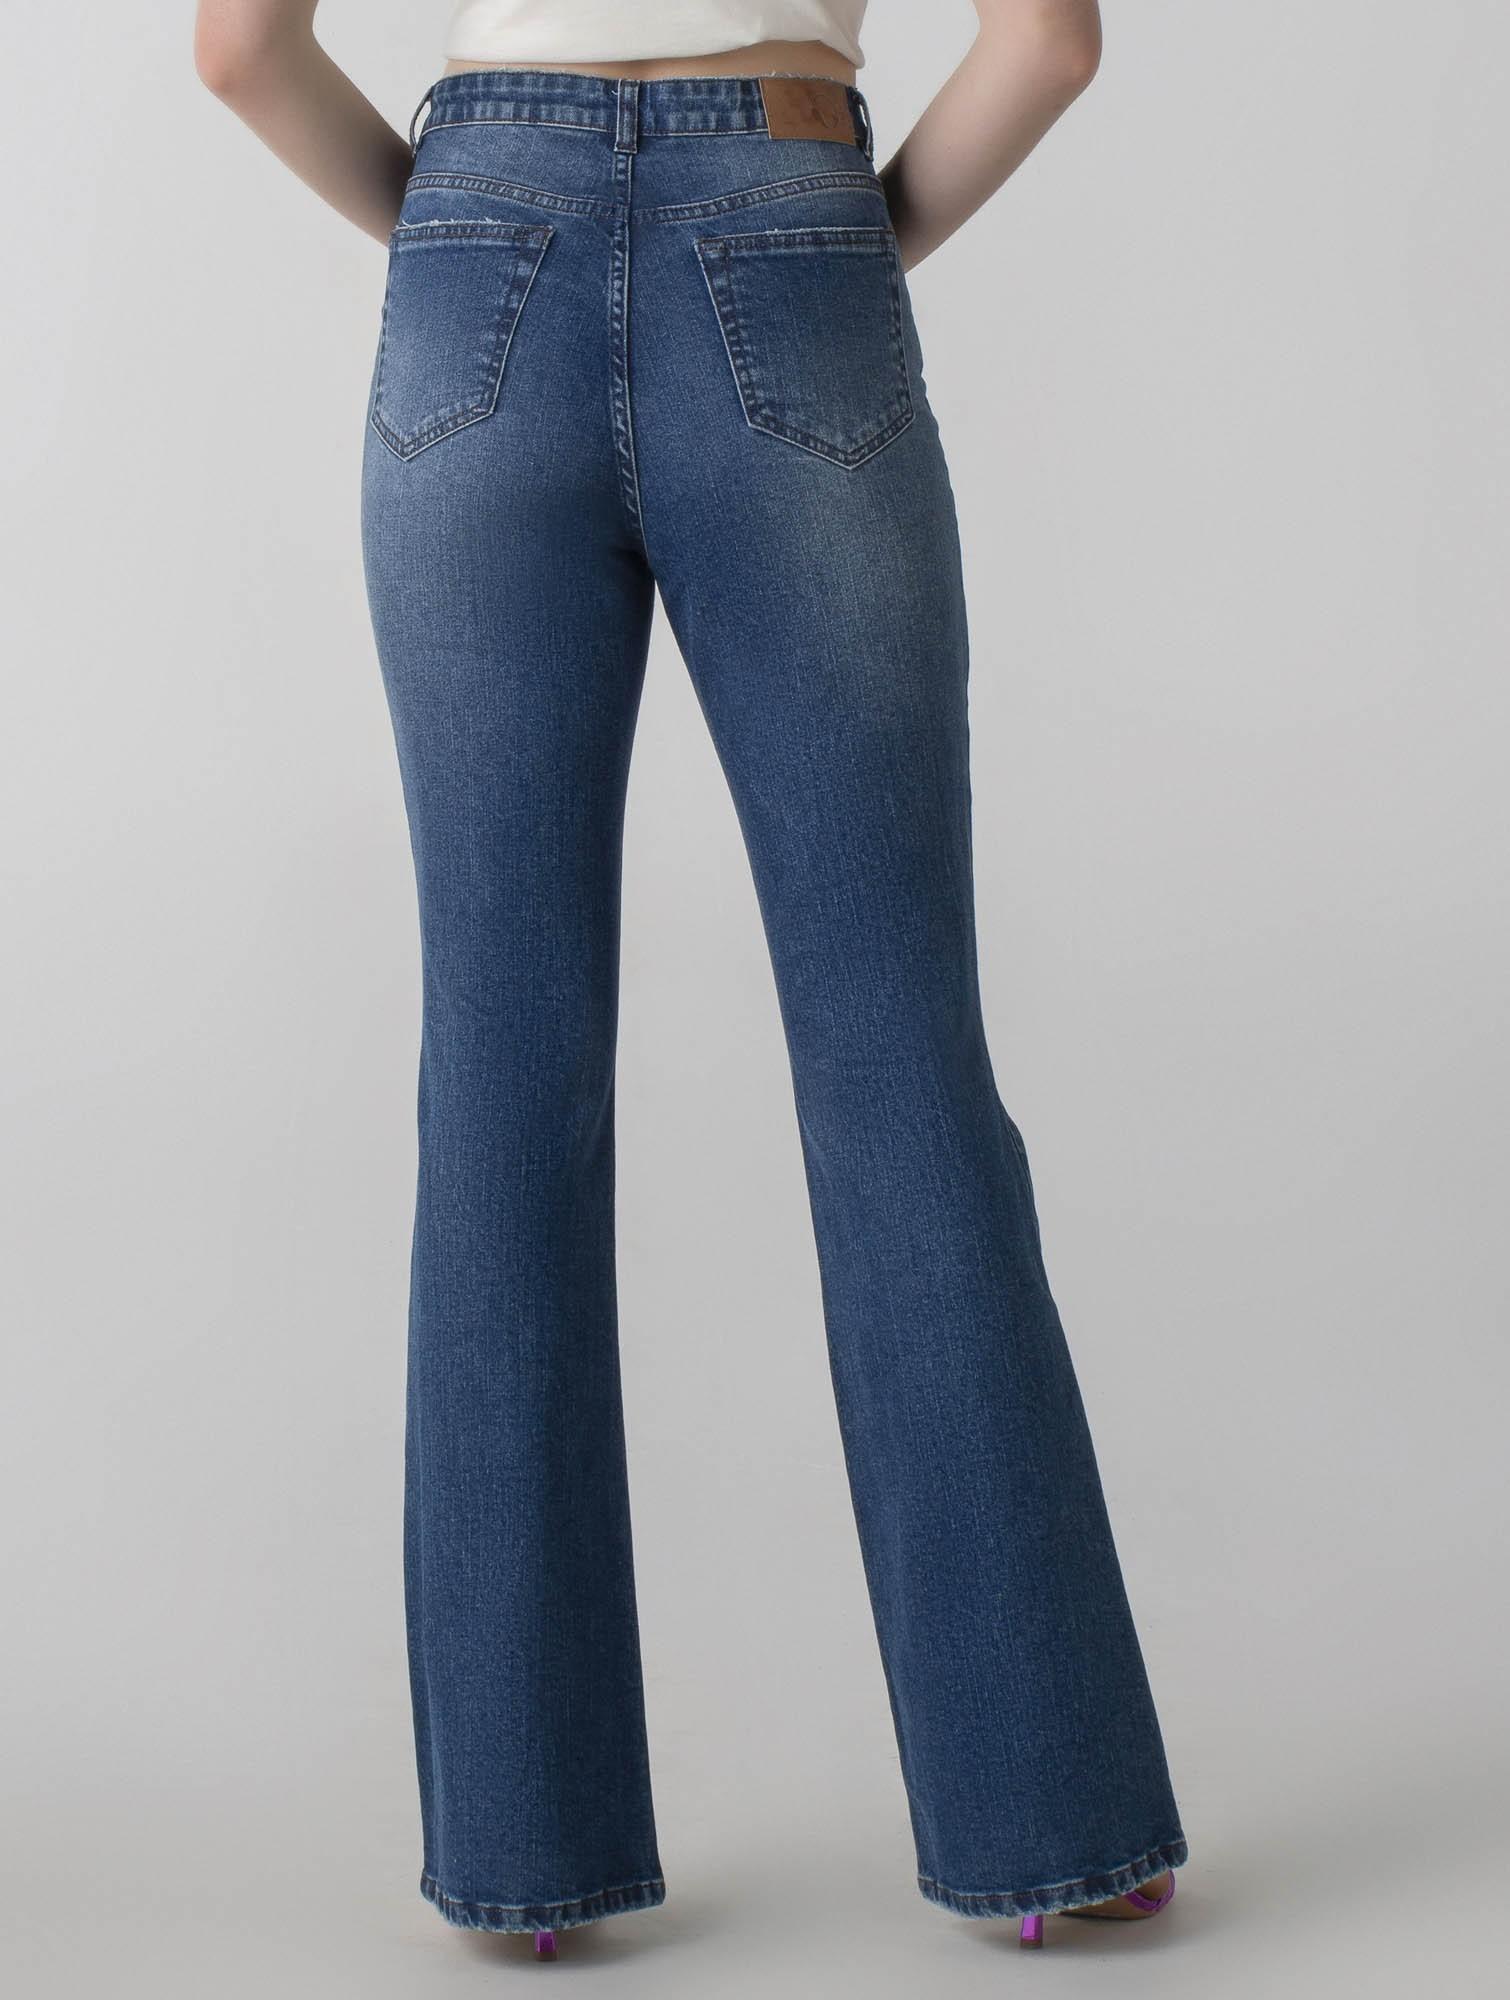 Calça jeans flare cós alto - Daily